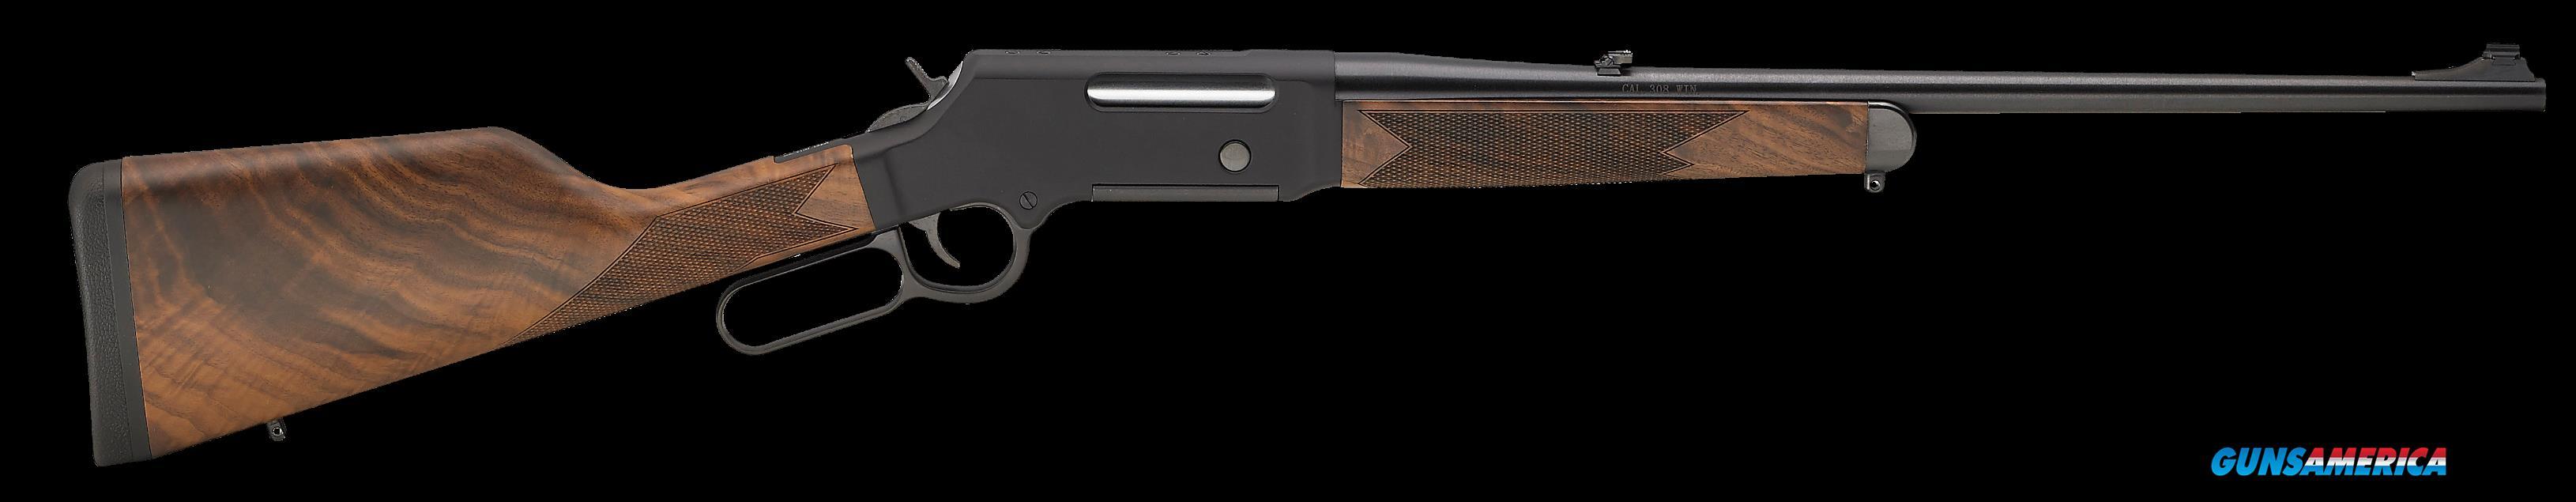 Henry Long Ranger, Henry H014s243  Long Ranger 243 Sights  Guns > Pistols > 1911 Pistol Copies (non-Colt)